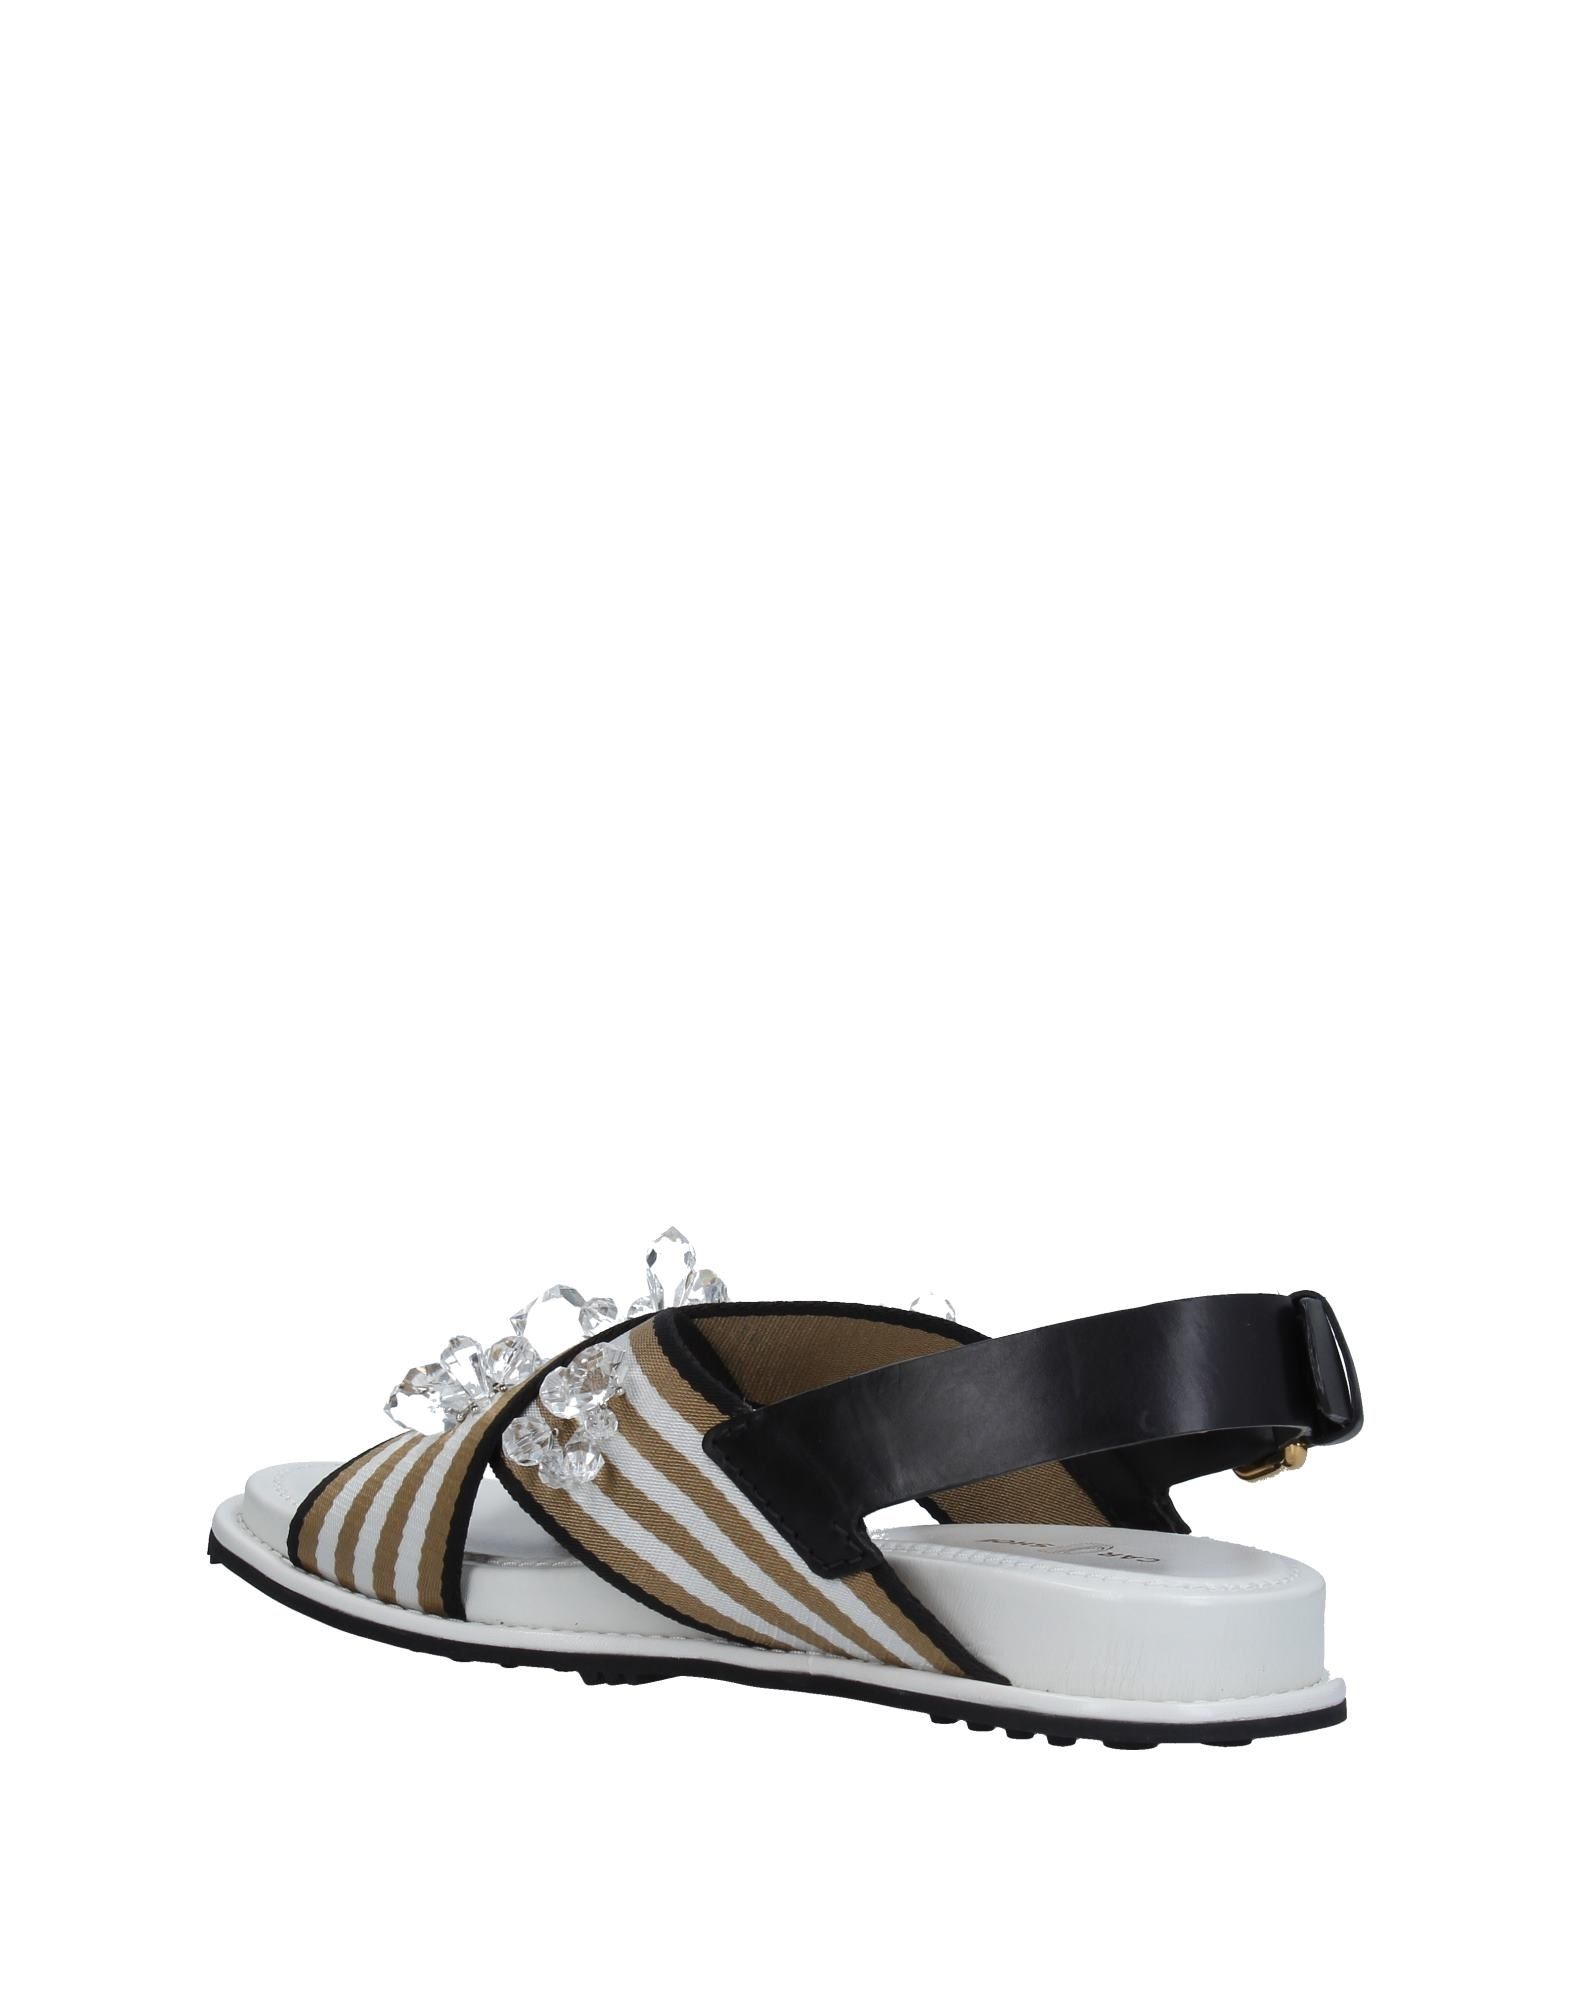 Stilvolle Damen billige Schuhe Carshoe Sandalen Damen Stilvolle  11328059CK e6e706